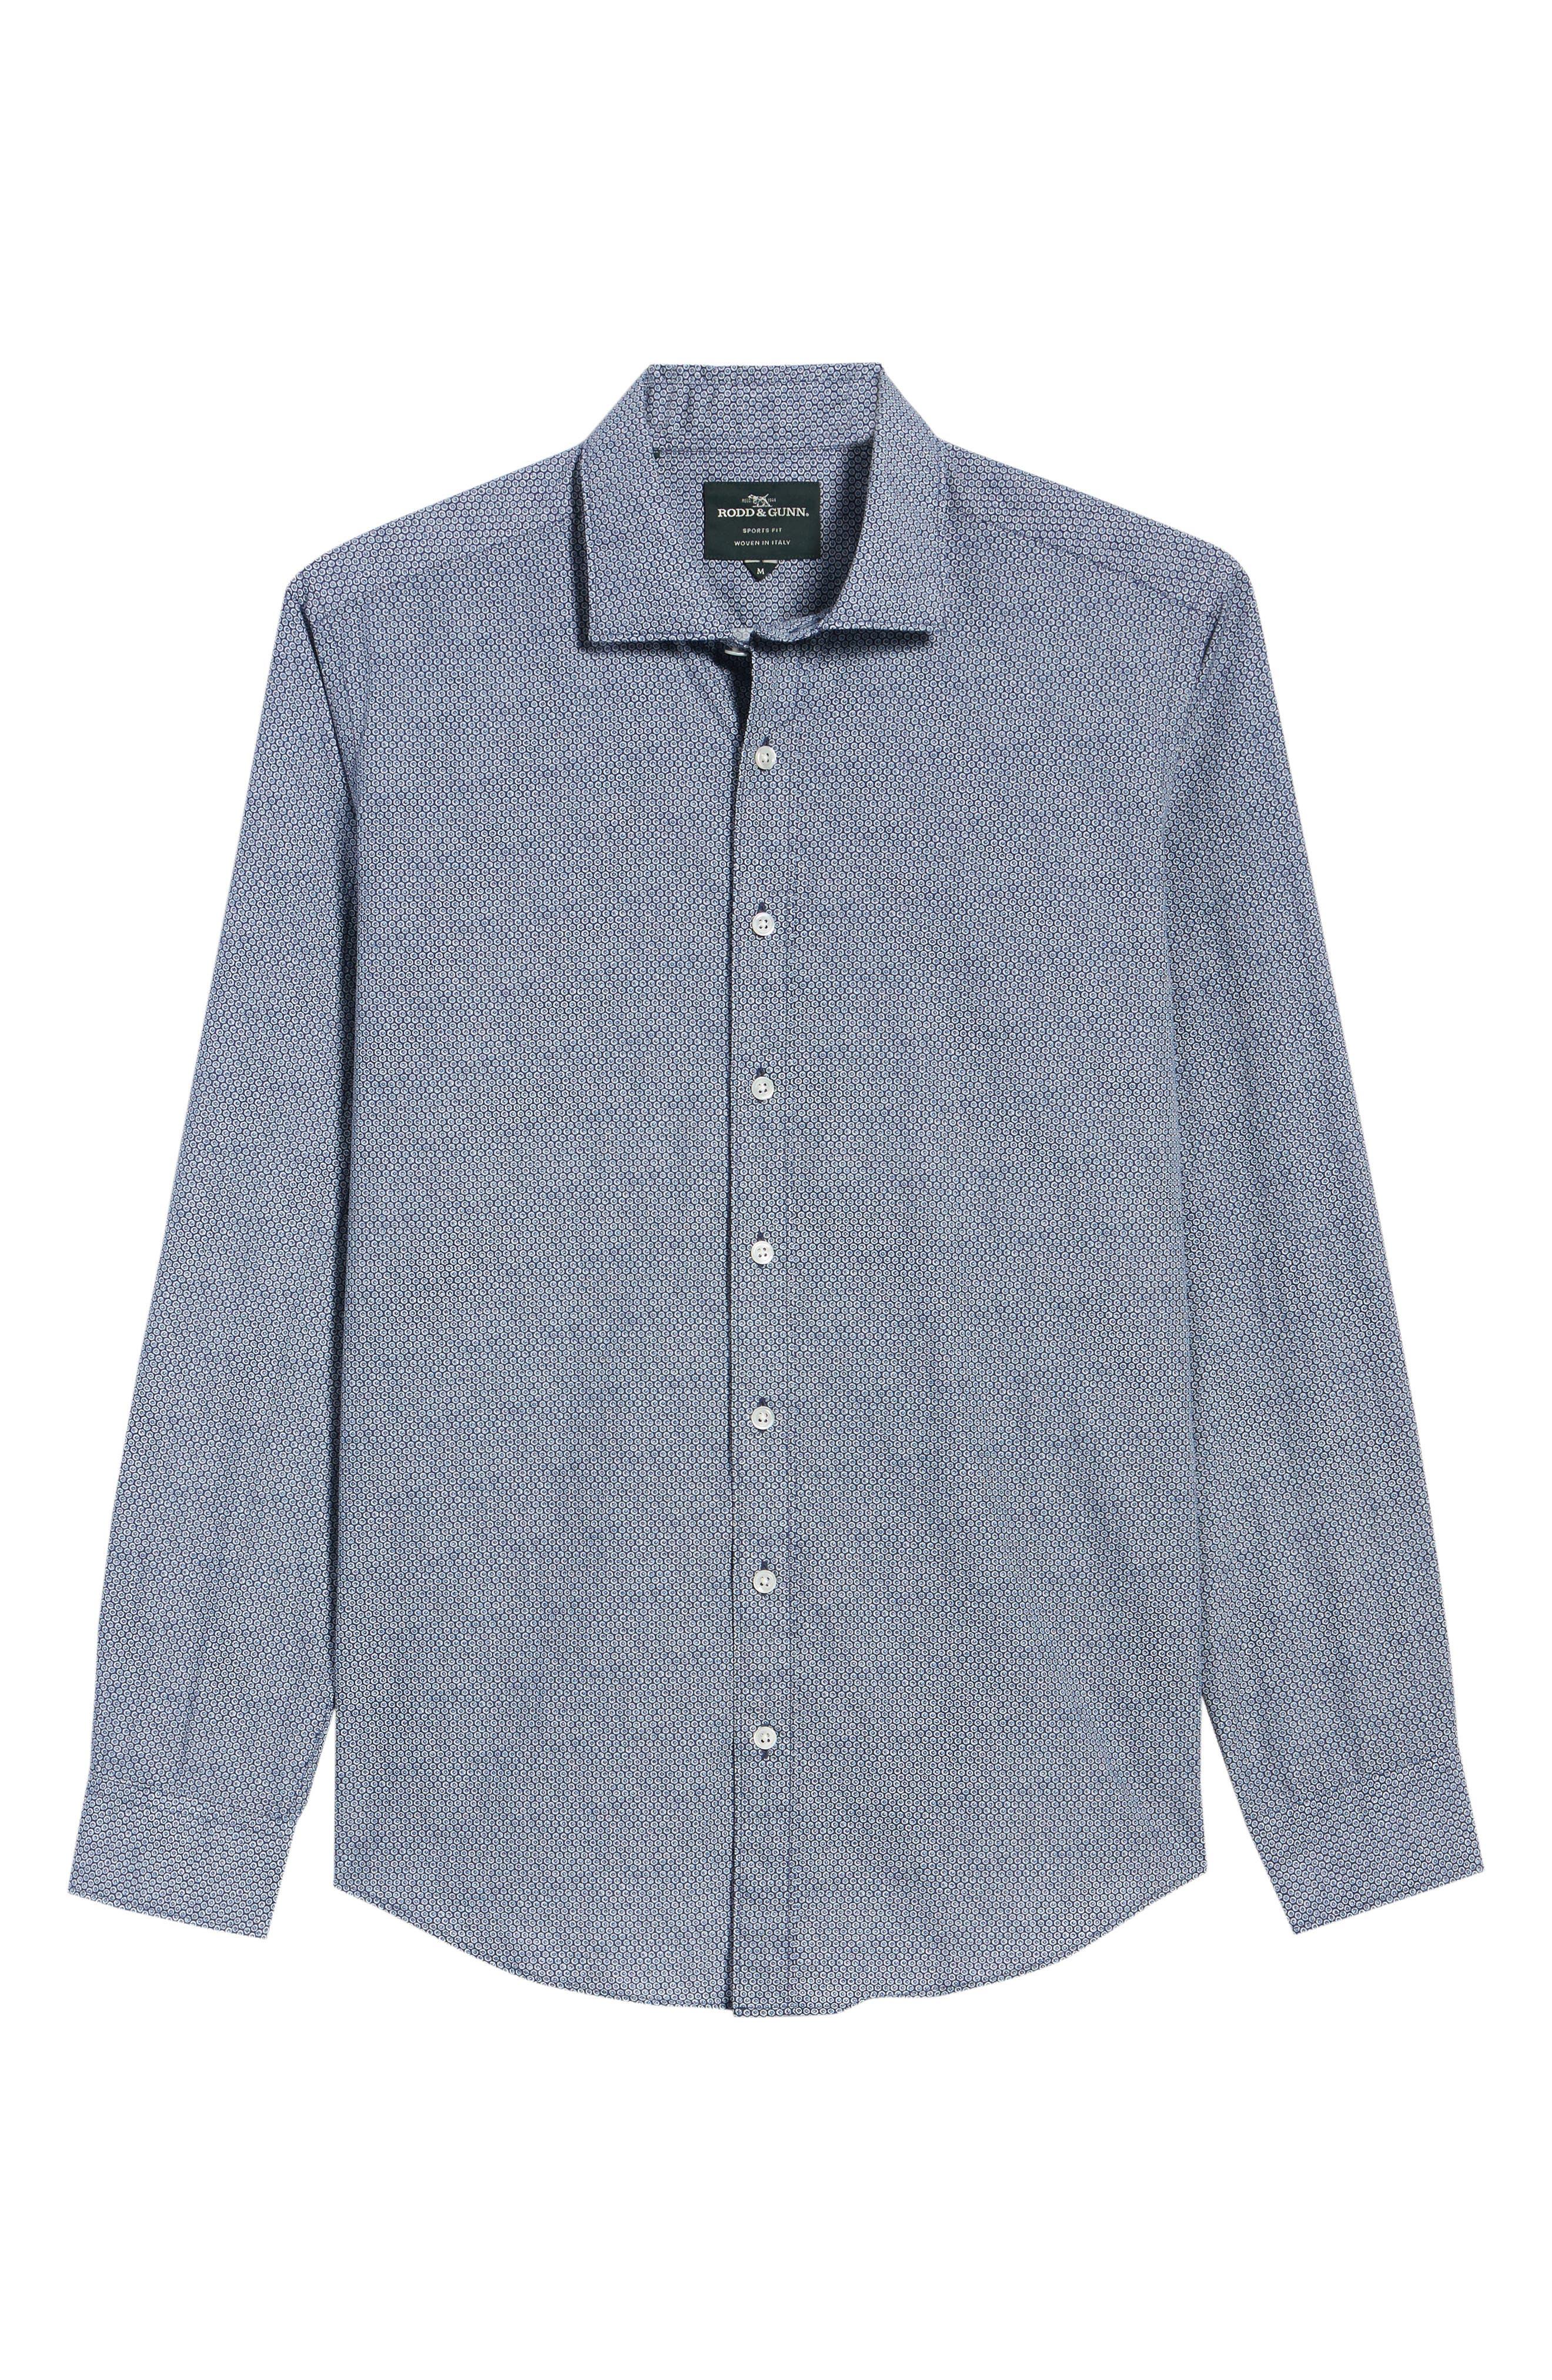 Beacon Point Regular Fit Sport Shirt,                             Alternate thumbnail 6, color,                             Navy